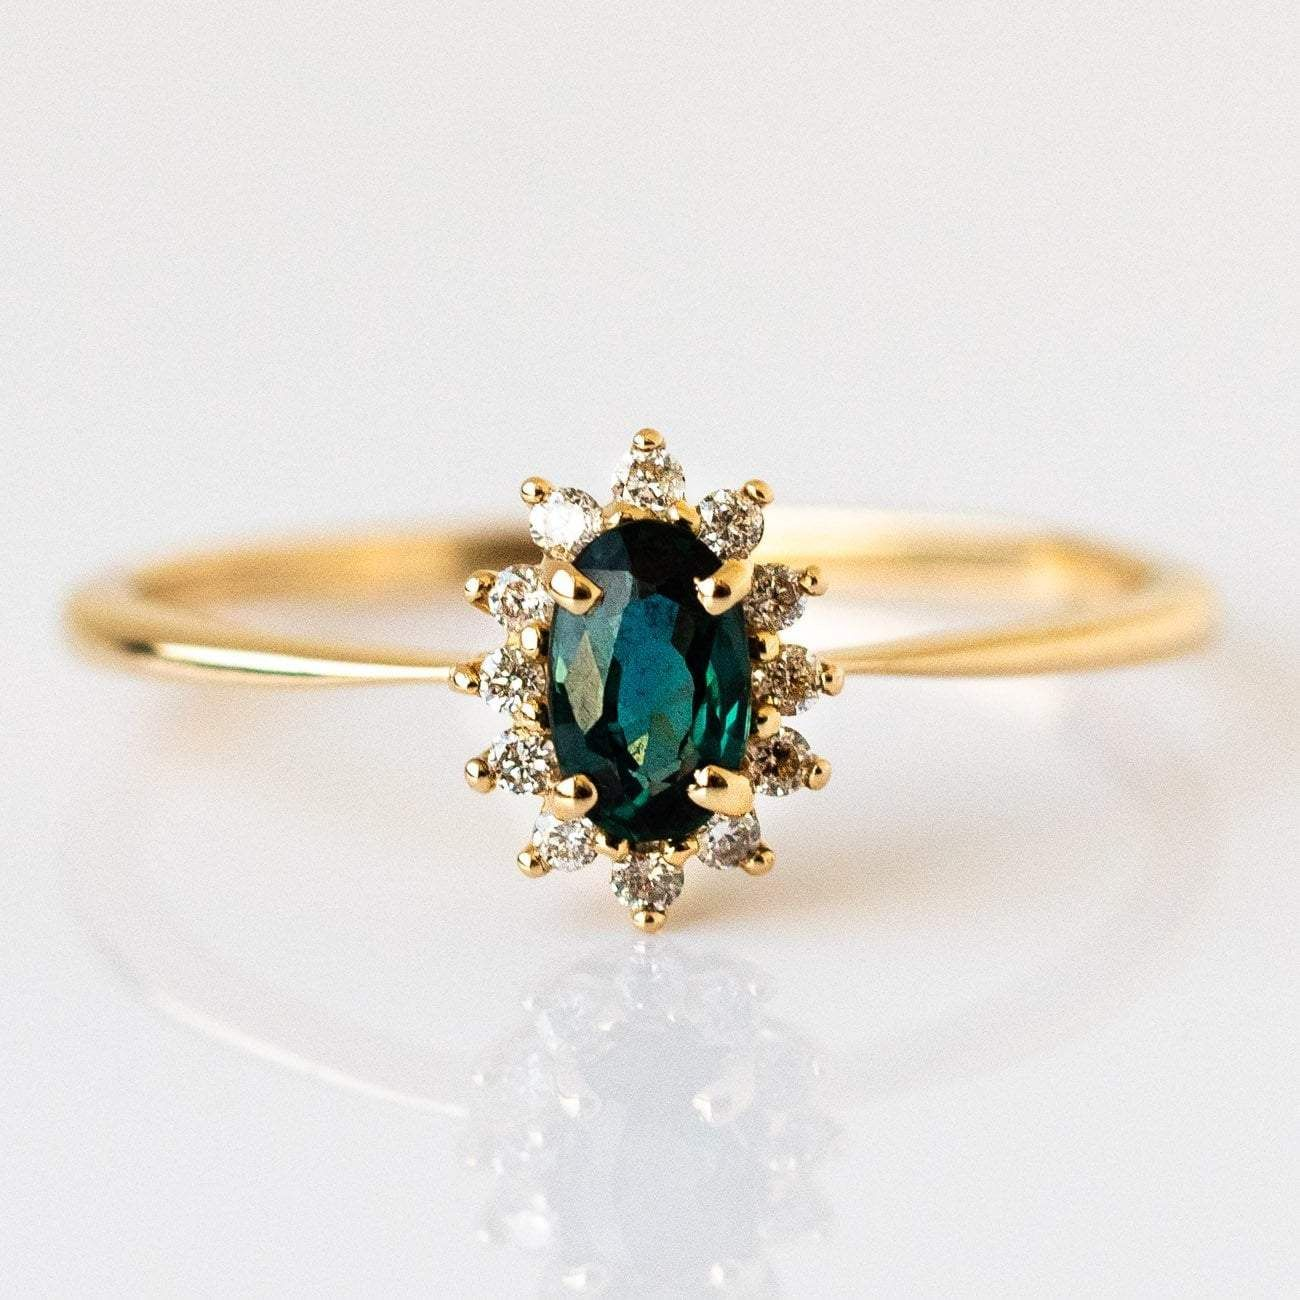 340 Teal sapphire 5 x 3mm Diamond 1.4mm 14k solid yellow